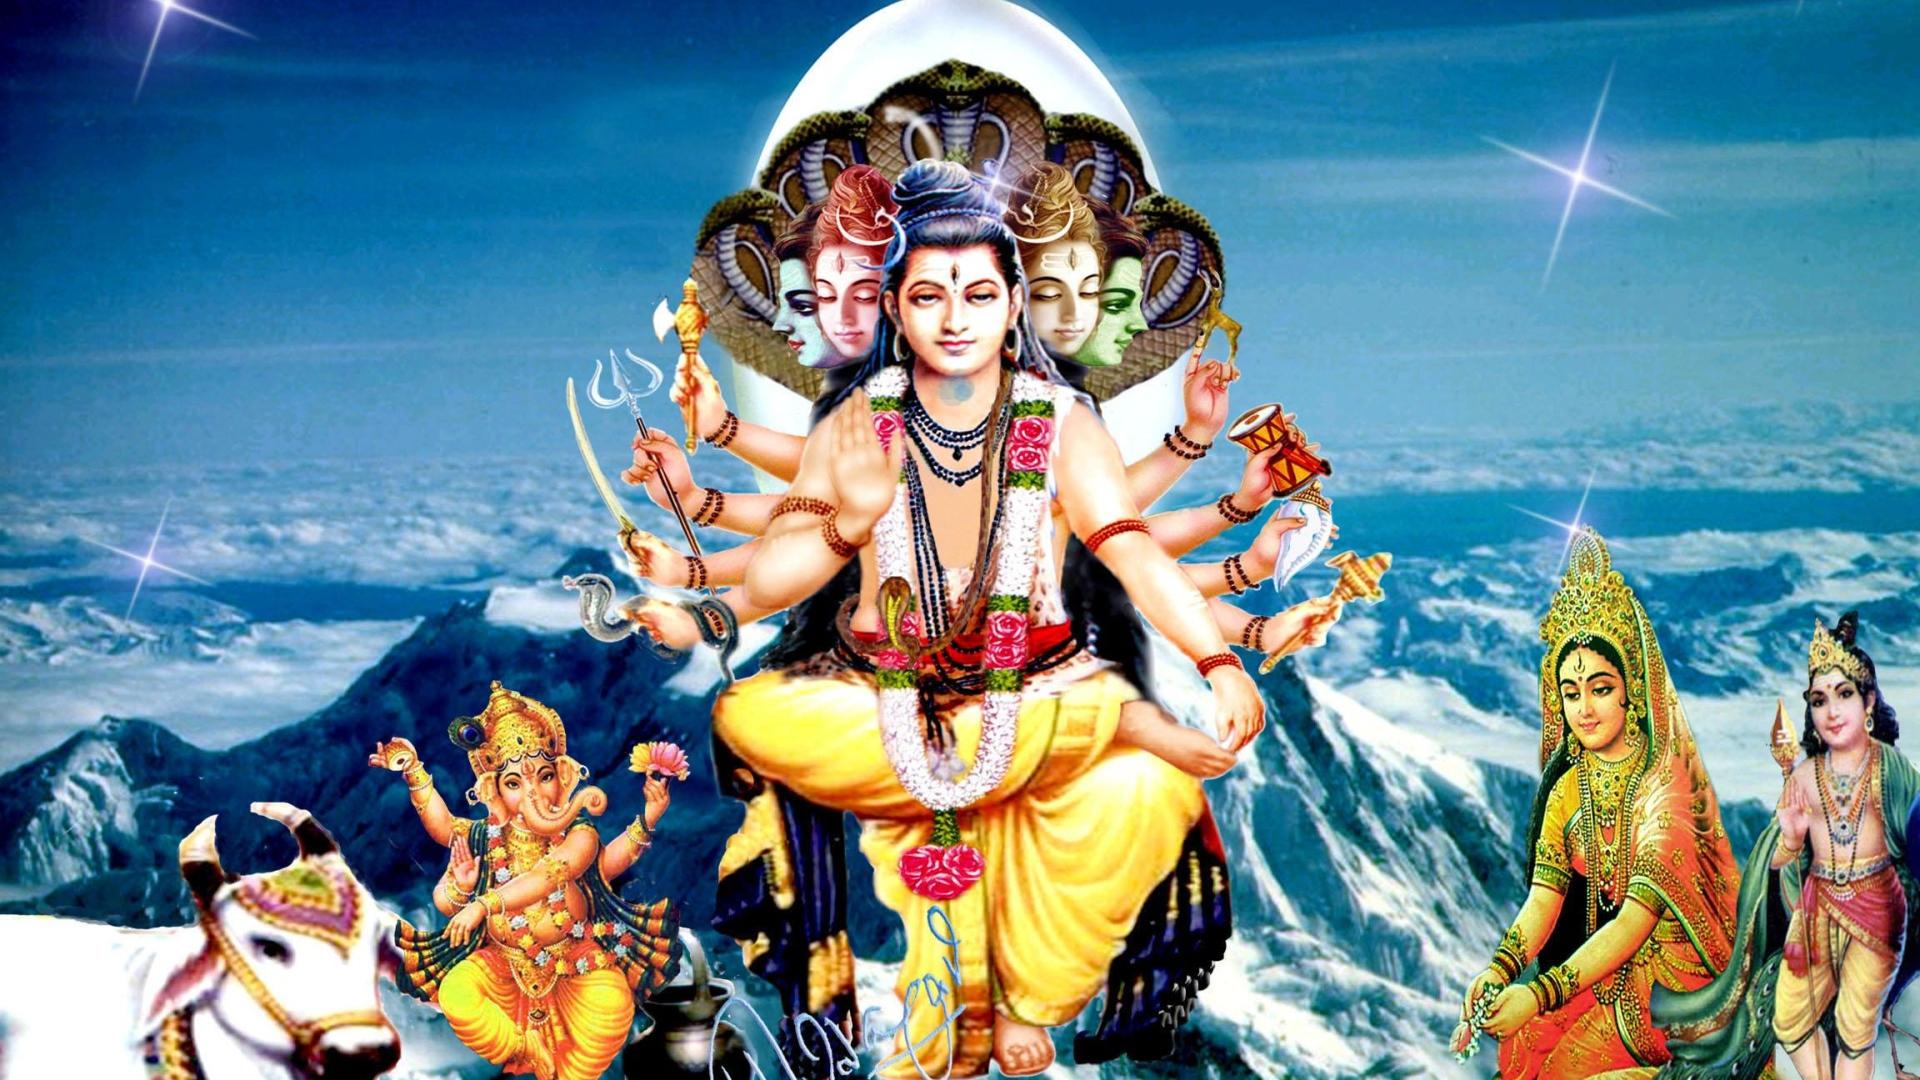 1366x768 Lord Shiva Desktop Background: Lord Shiva Desktop Wallpapers 1920x1080